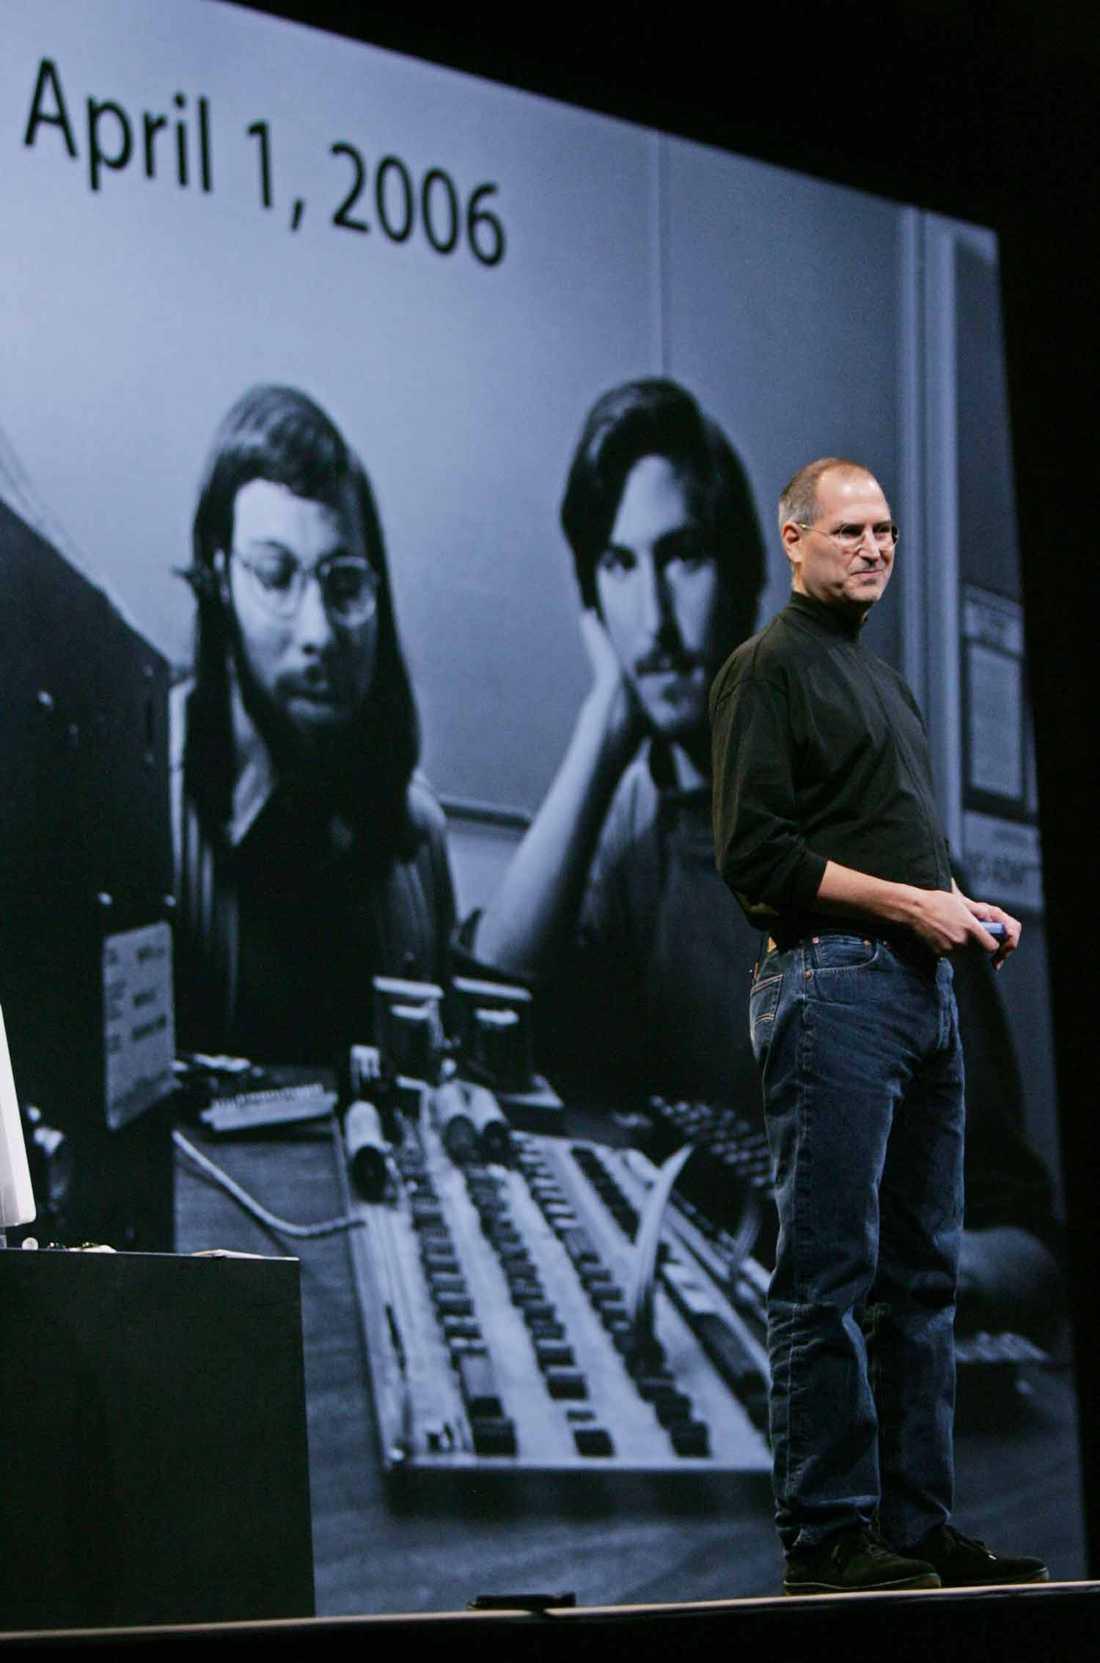 30 år 2006 fyllde Apple 30 år och Steve Jobs ler åt den 30 år gamla bilden på honom och medgrundaren Steve Wozniak på MacWorld i San Fransisco.